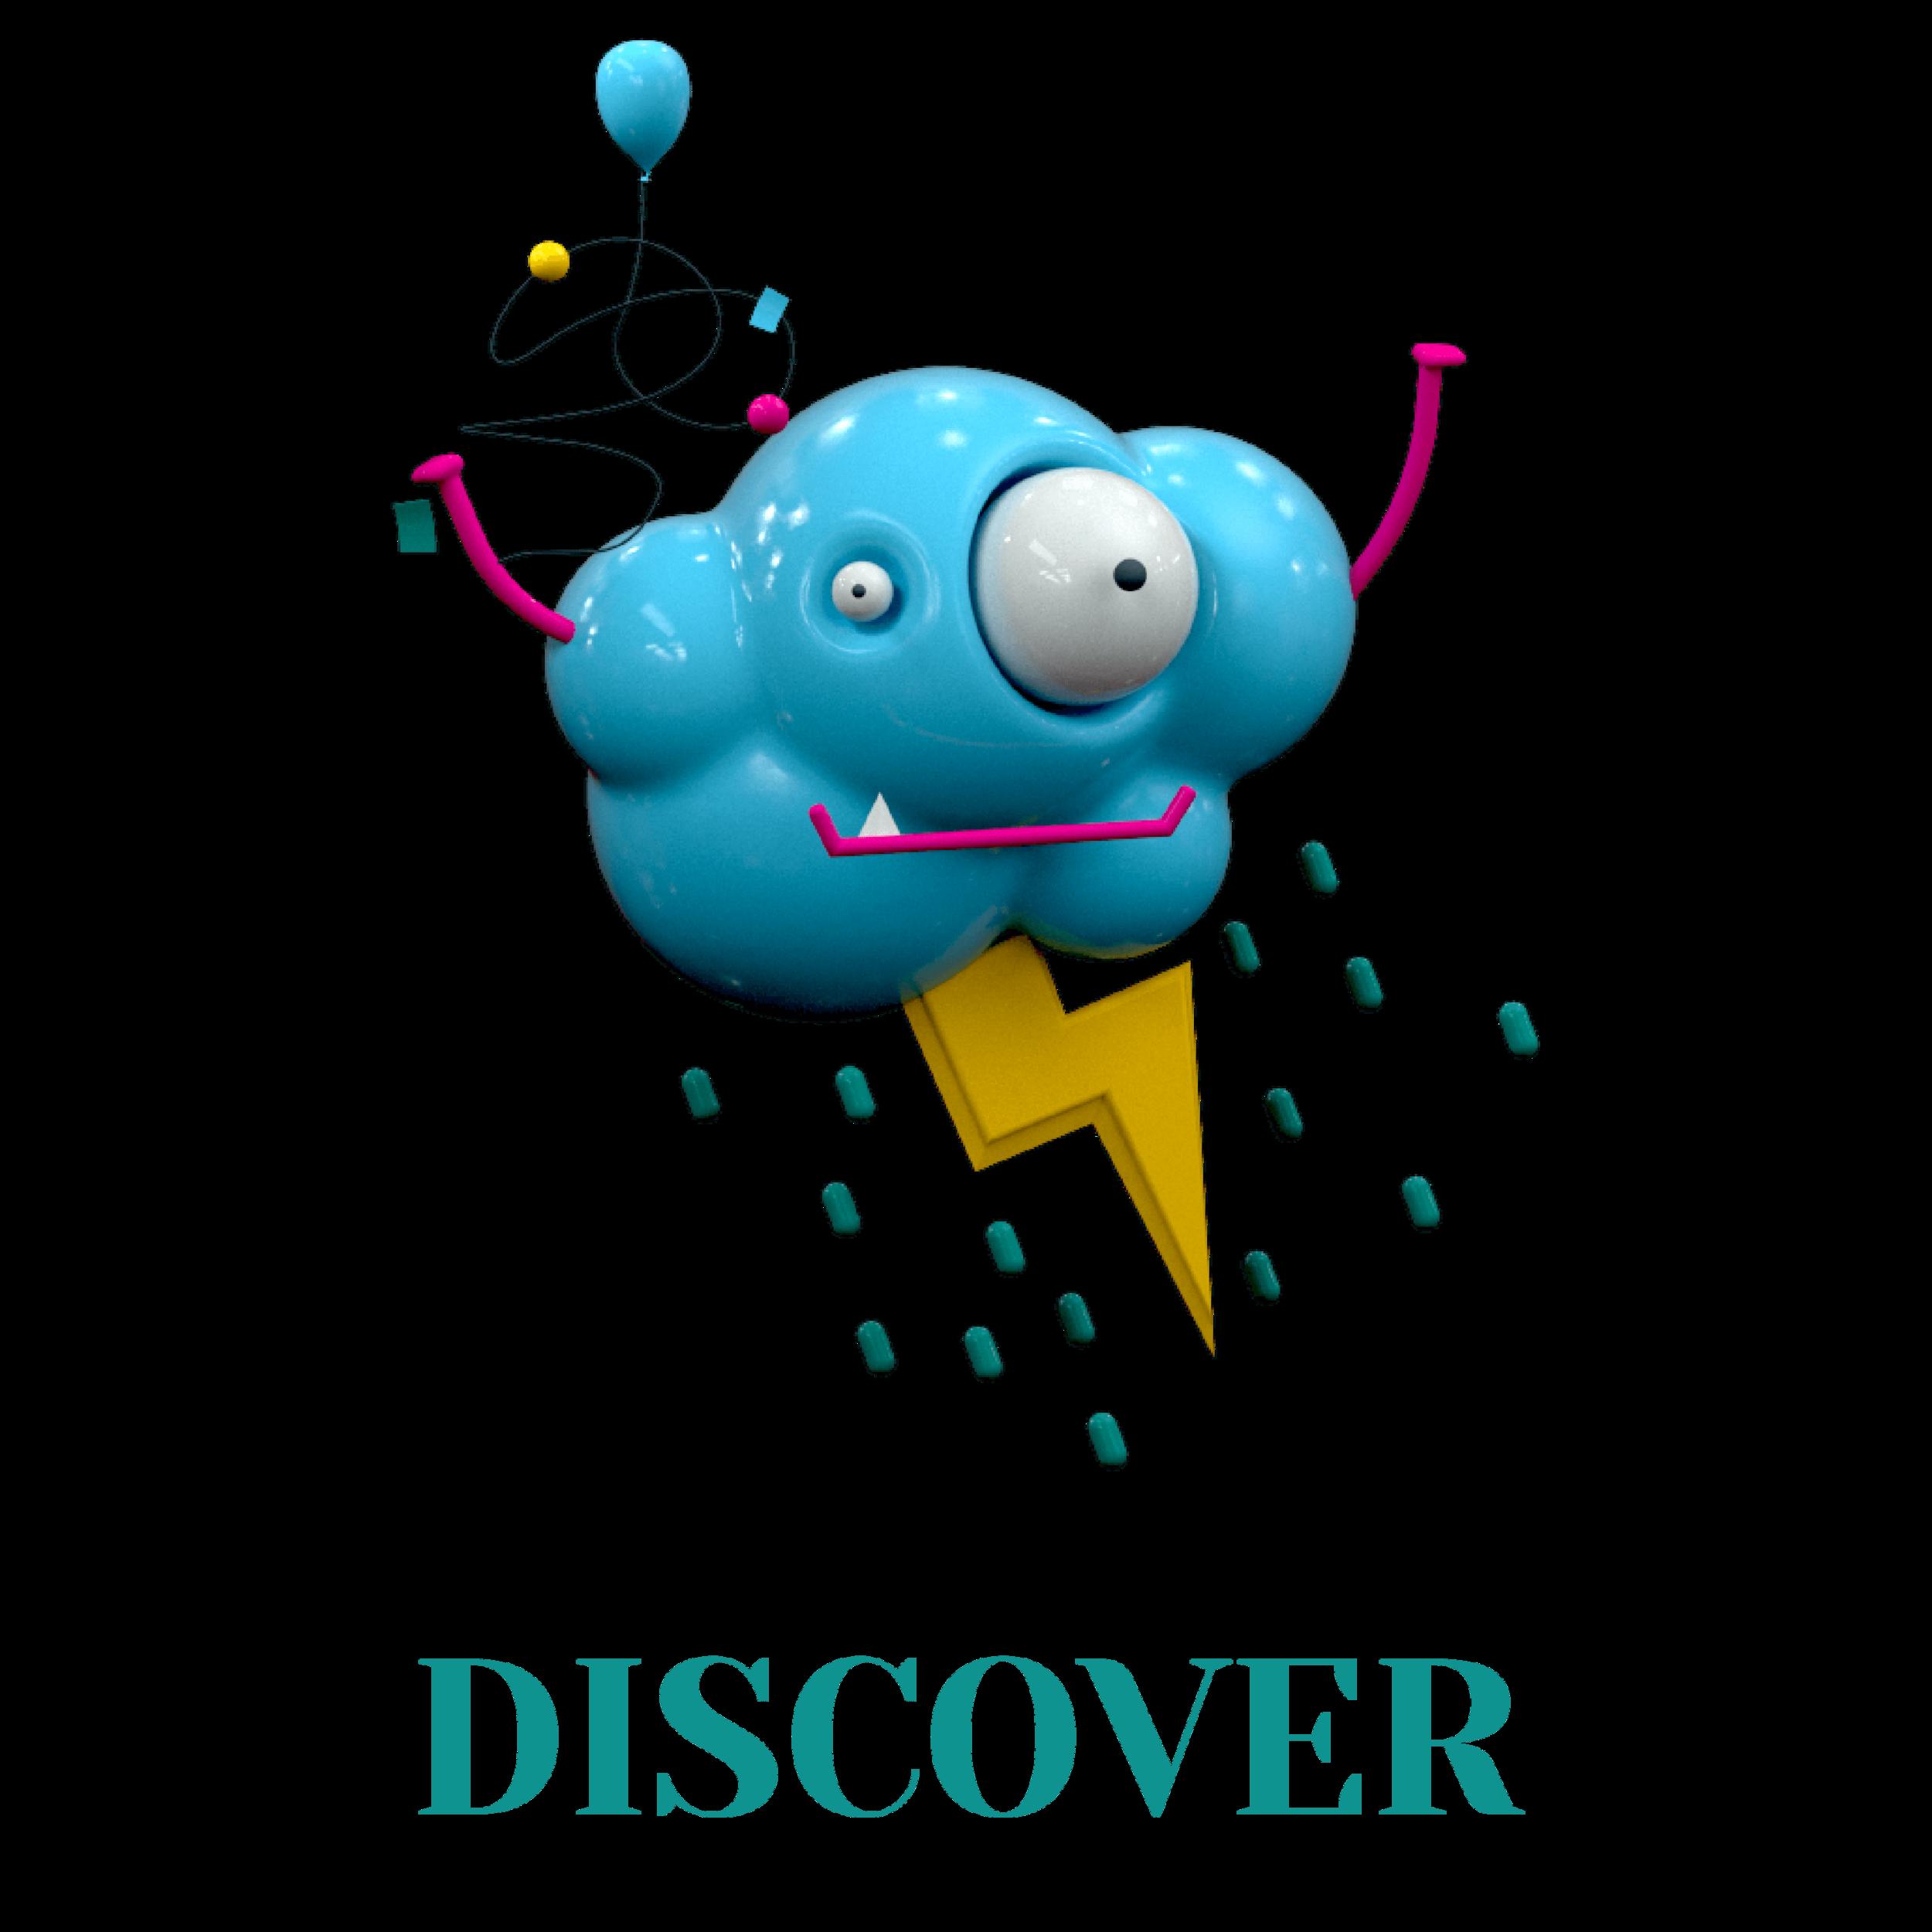 1_ET_Process_Discover_2.png